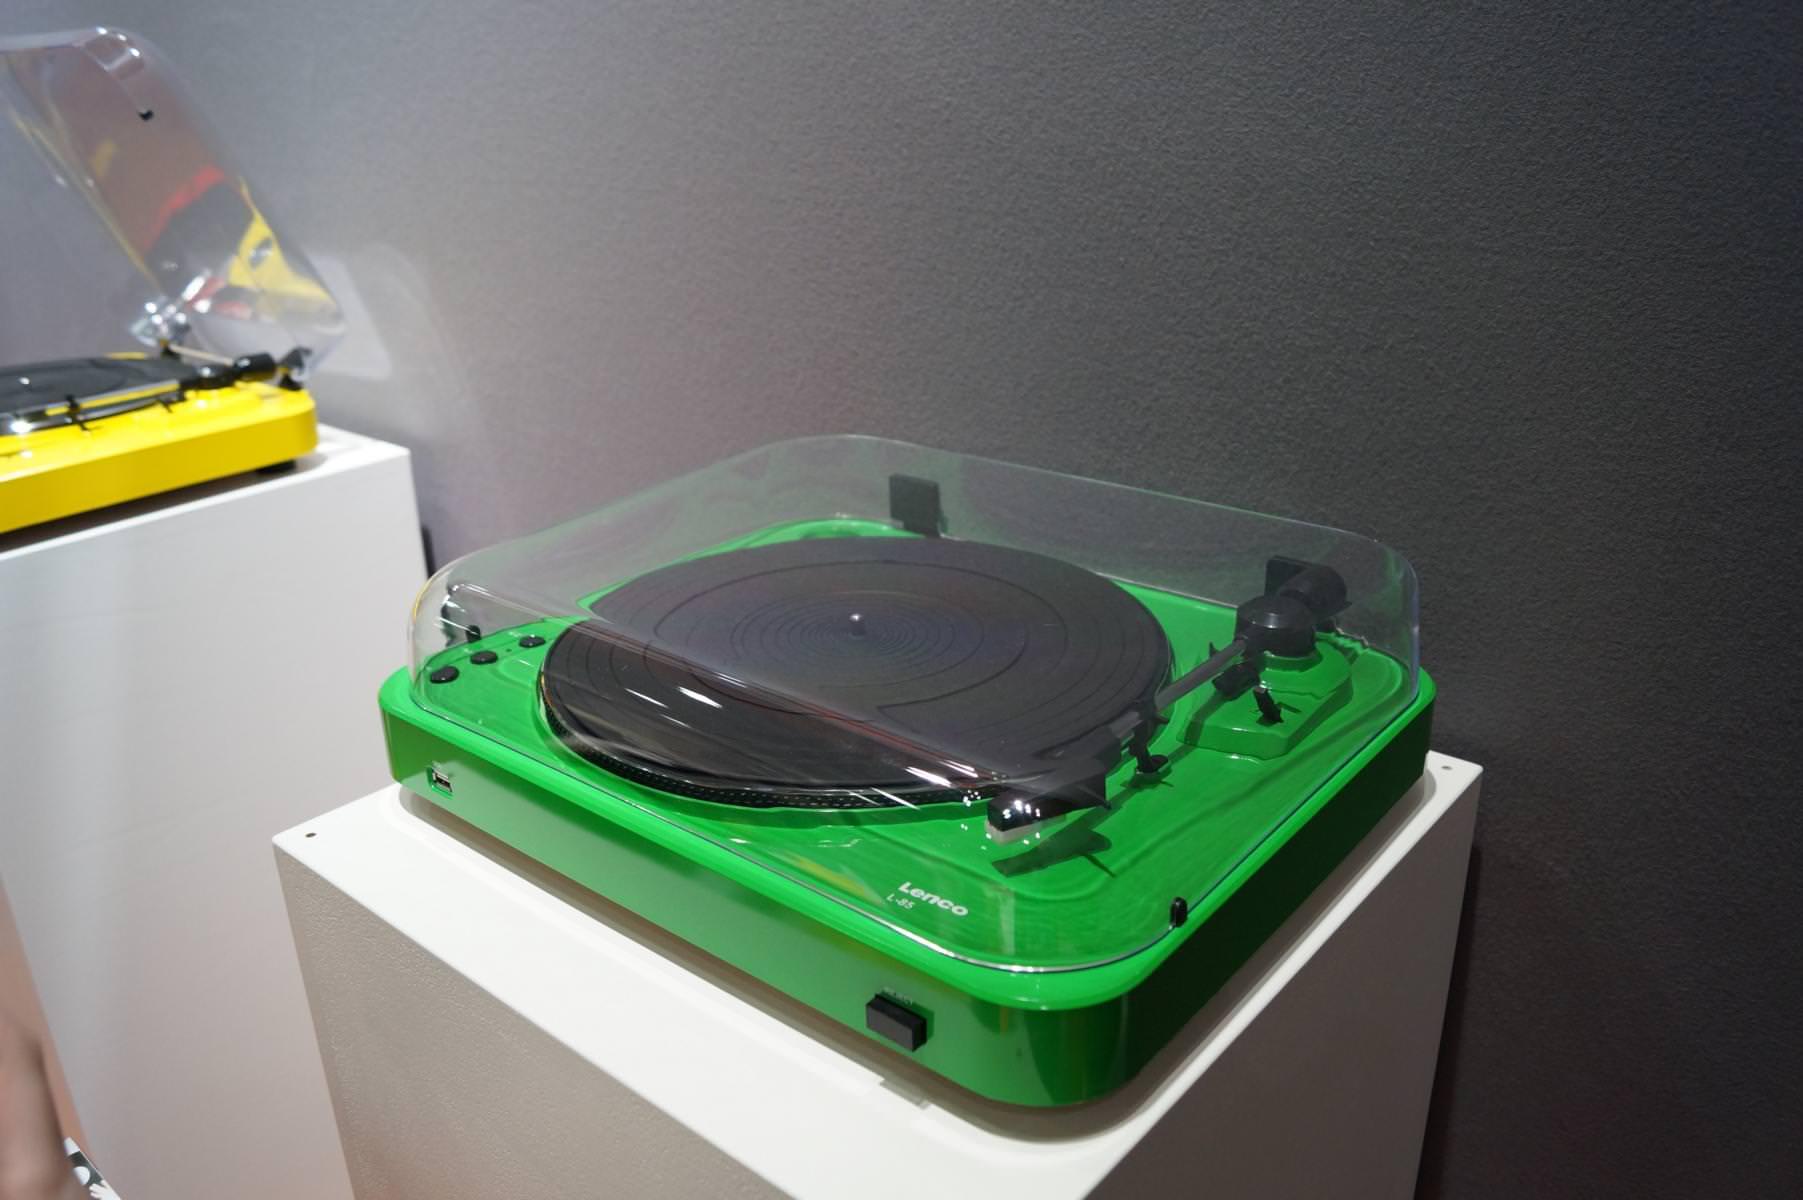 ifa 2014 lenco zeigt vernetztes lautsprechersystem retro. Black Bedroom Furniture Sets. Home Design Ideas